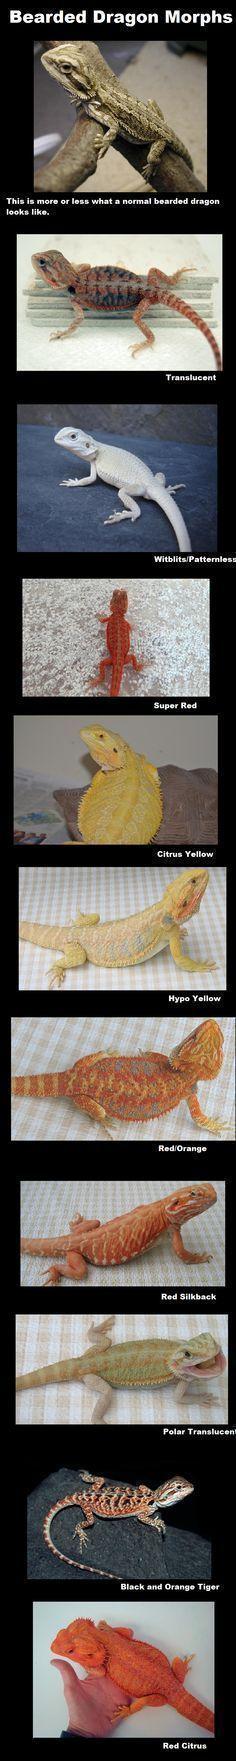 Bearded Dragon Morphs #funny #lol #humor #beardeddragonfunny